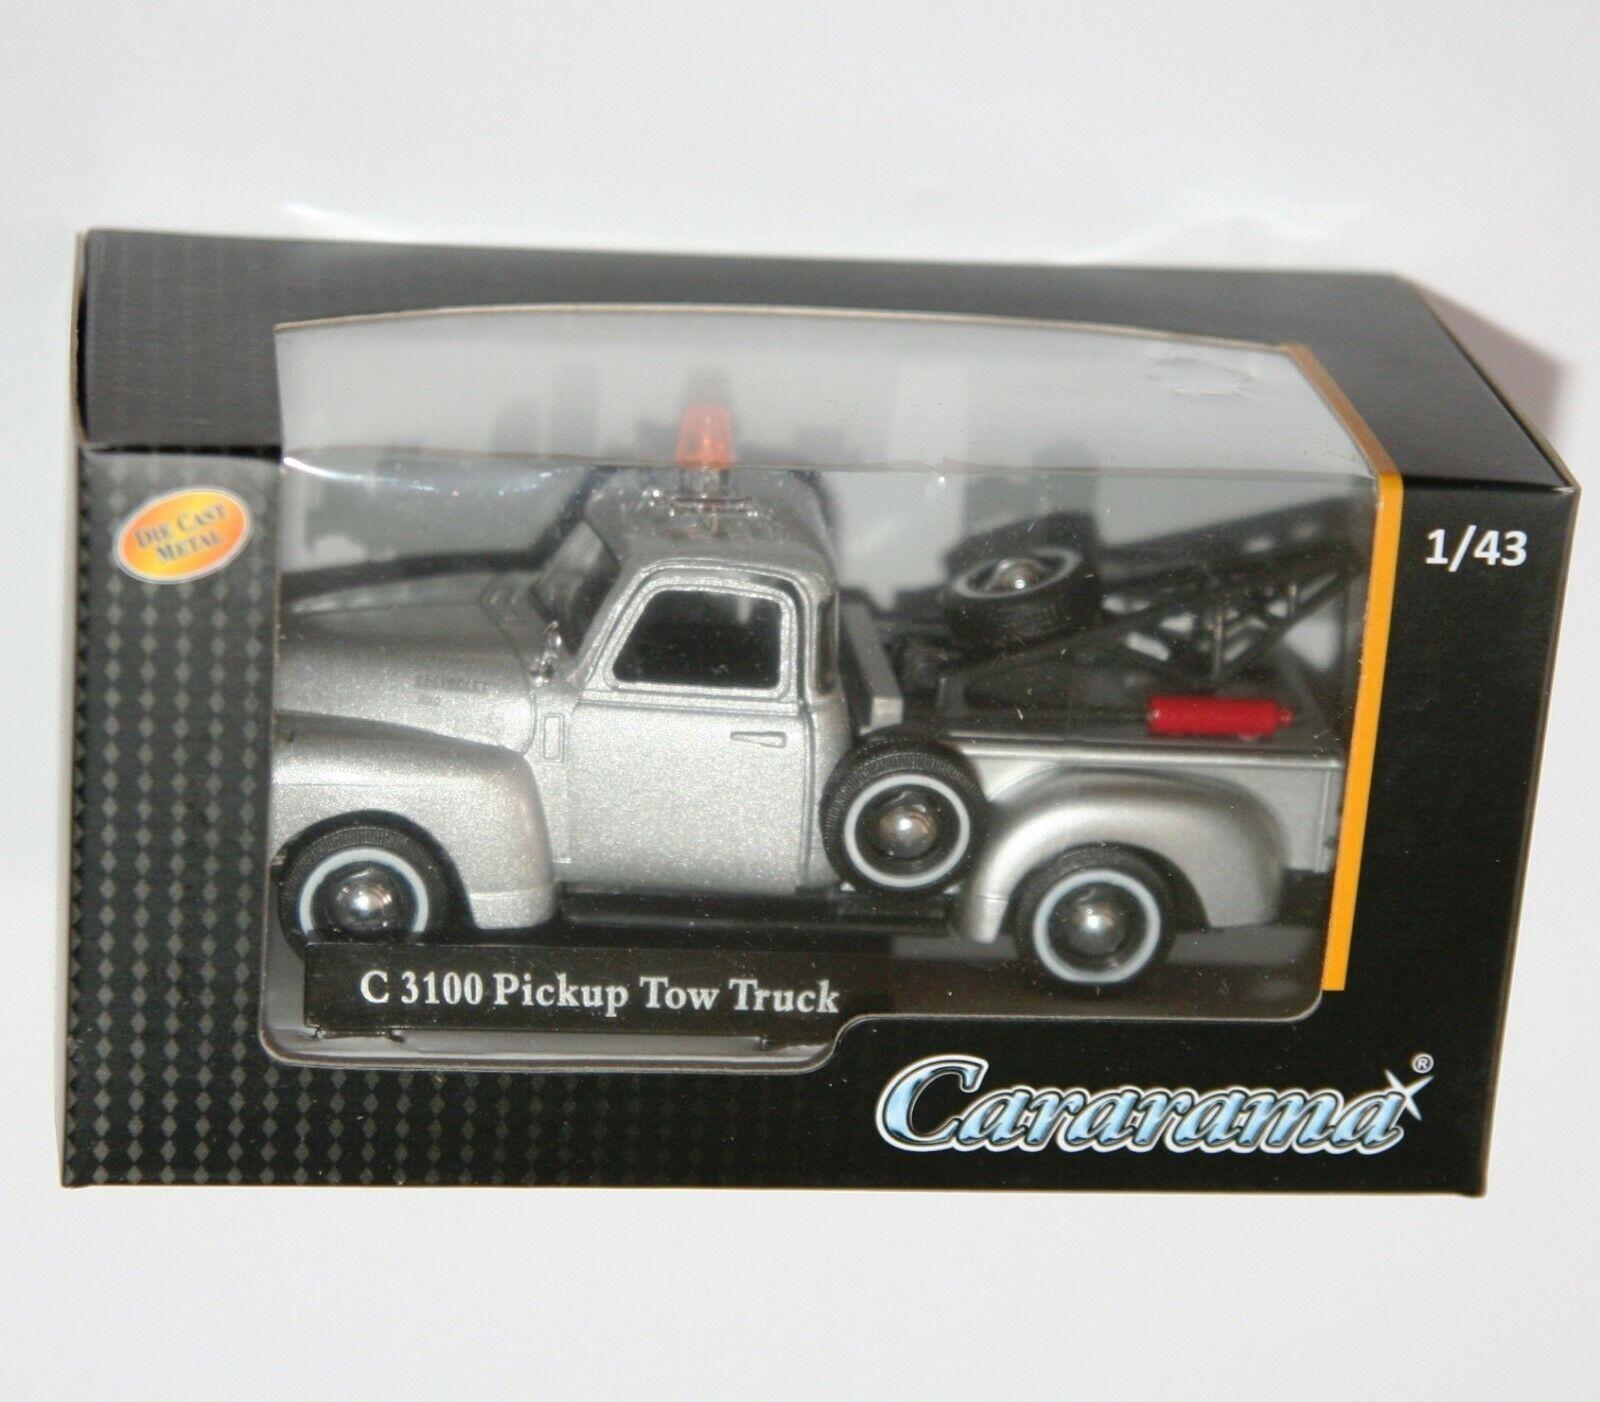 Chevrolet C3100 Pickup Tow Truck gelb Cararama Auto Modell 1:43